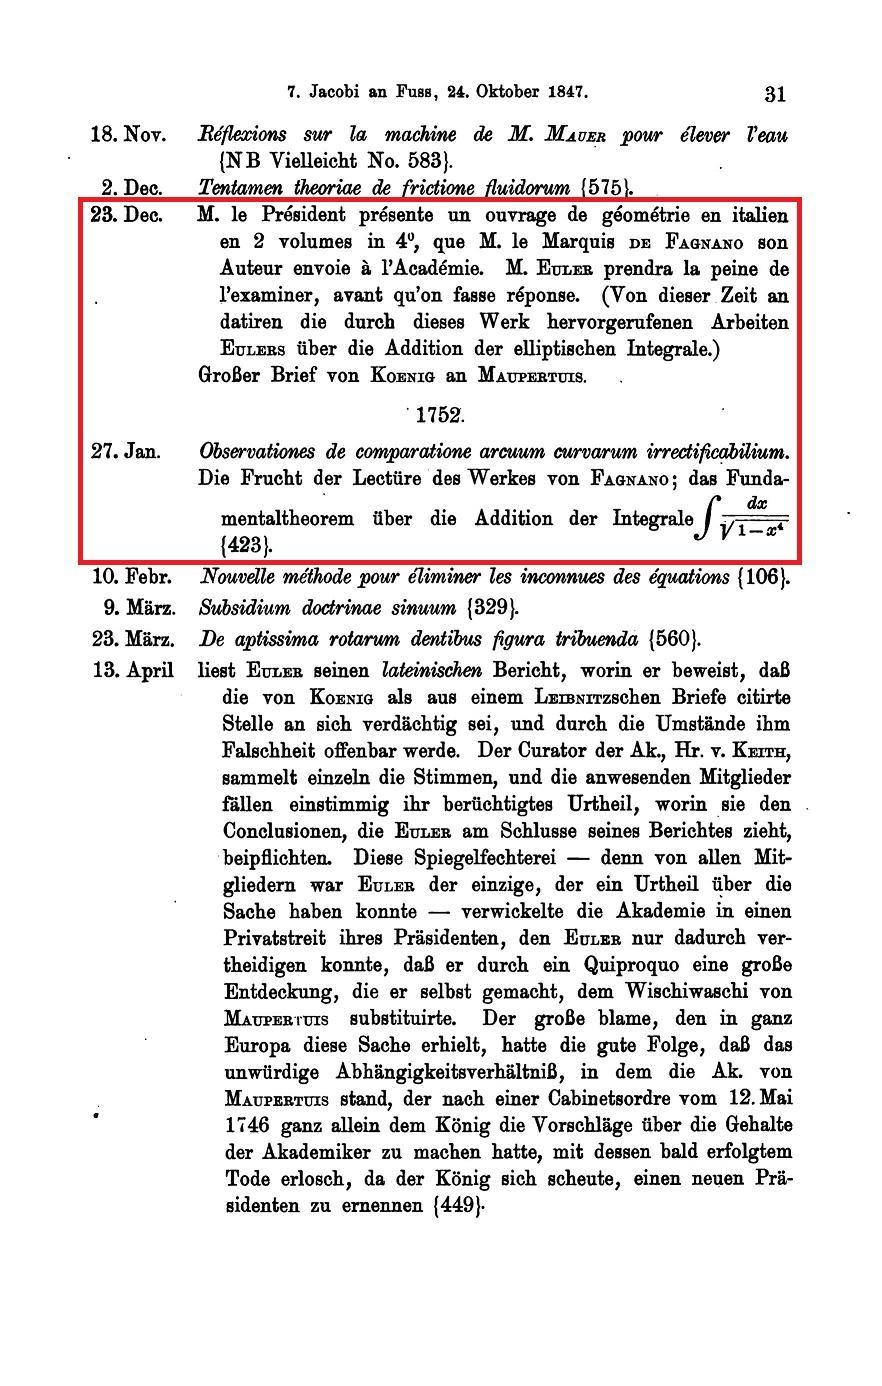 预篇:伯爵Fagnano与Euler的加法定理(I)